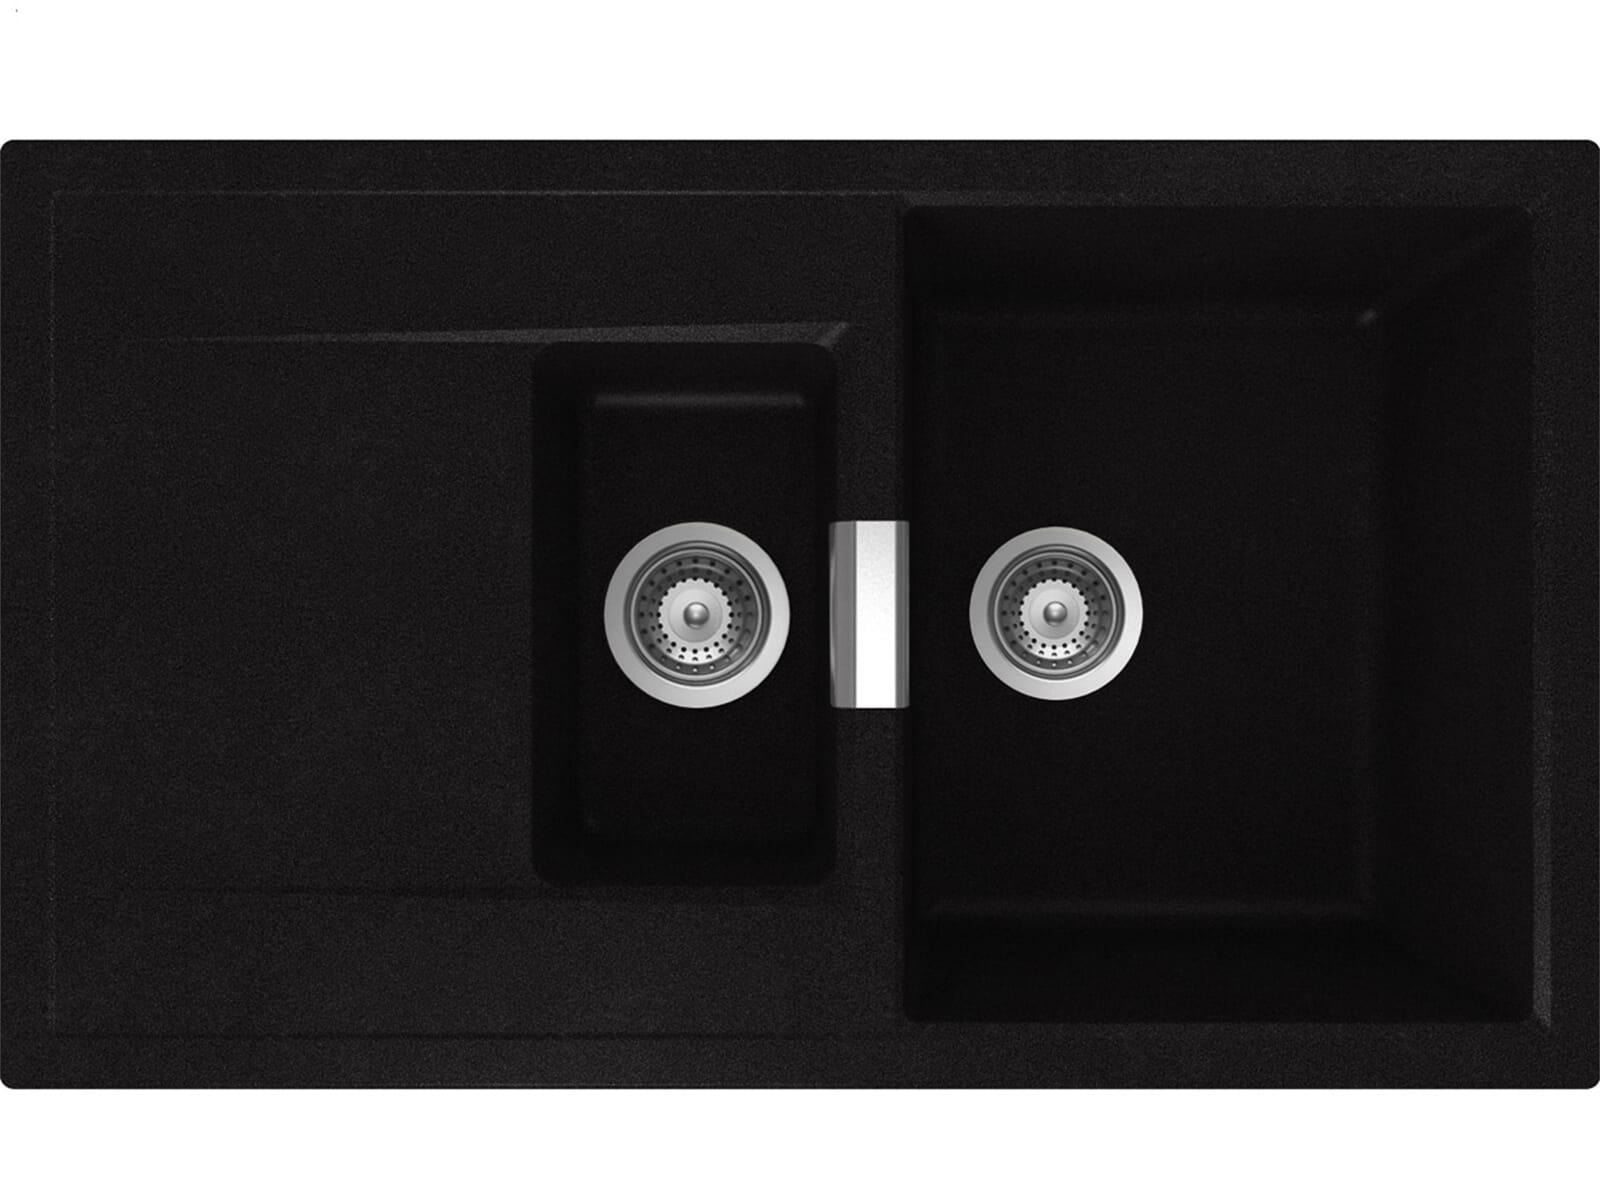 Schock Mono D-150 A Magma Granitspüle